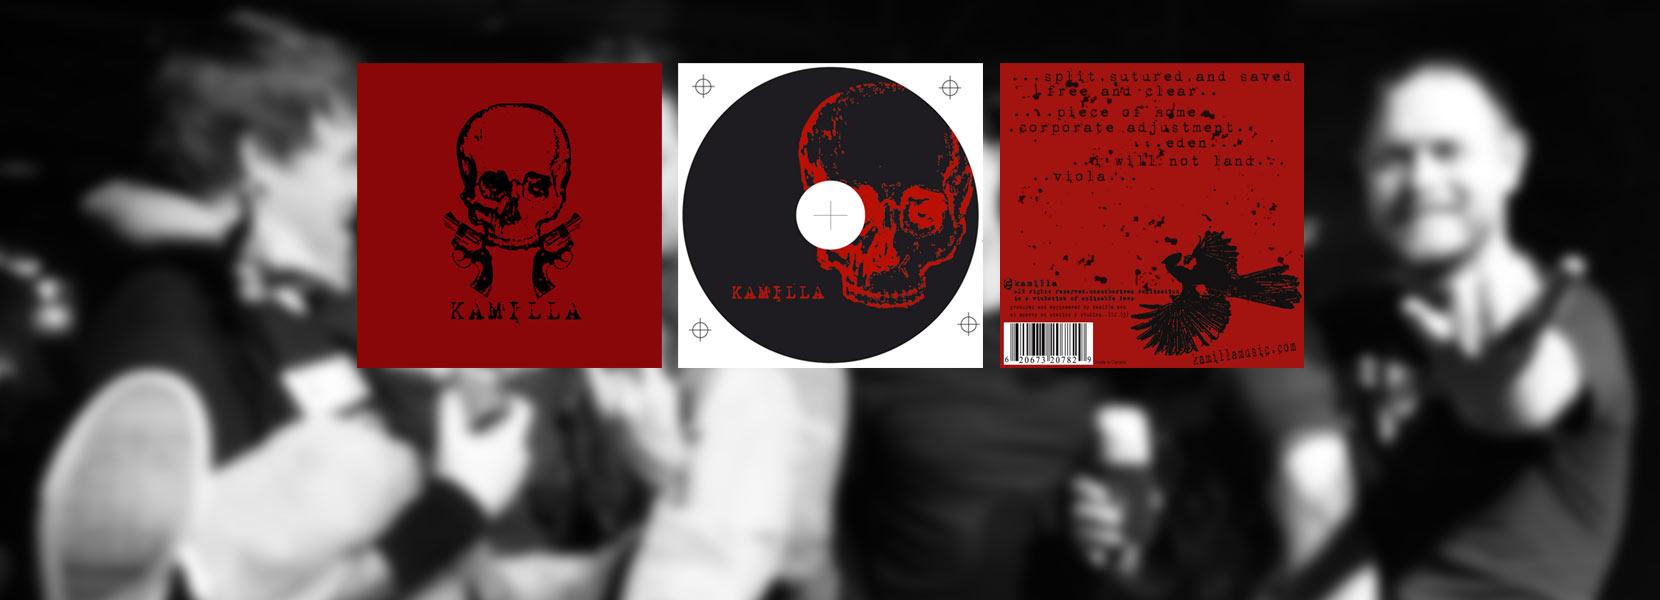 http://kamillamusic.com/wp-content/uploads/2014/11/Red-Album-Full.jpg